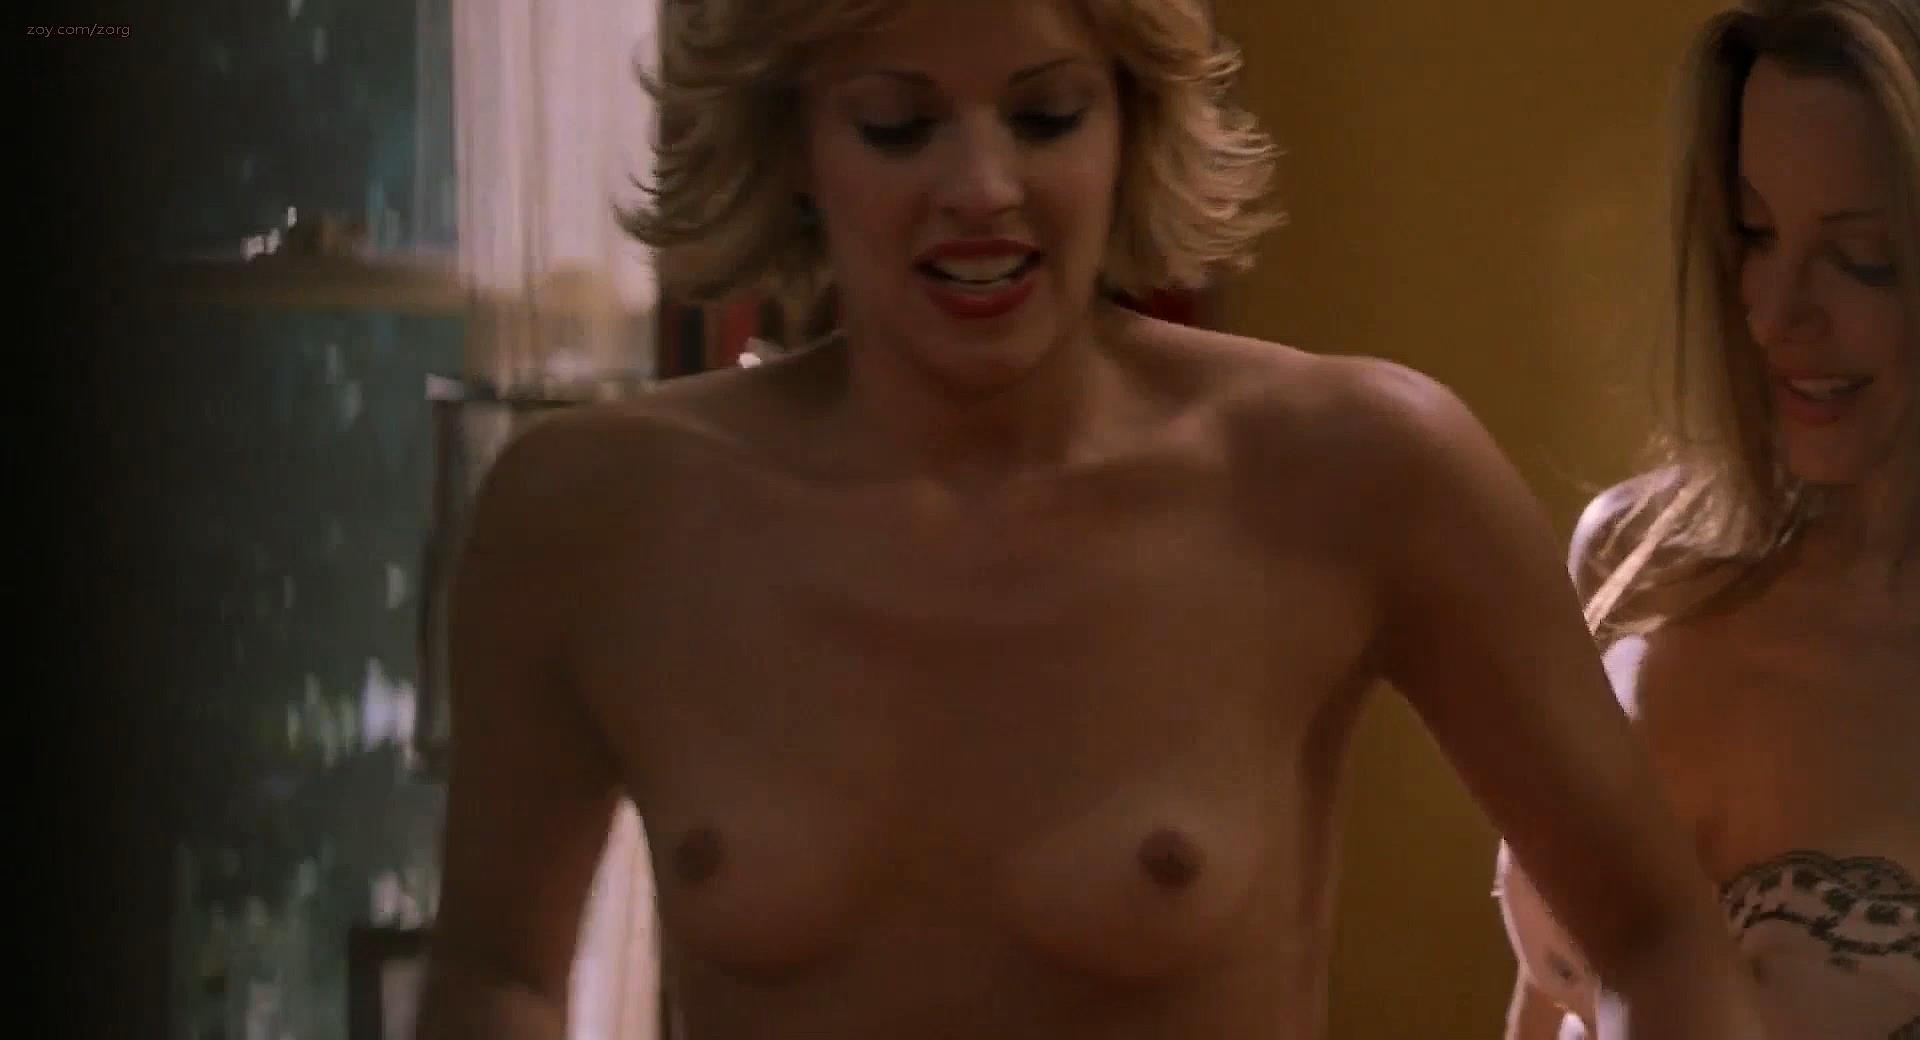 Anja Ali Samantha Lesbian Porn lisa arturo nude topless and denise faye nude and lesbian